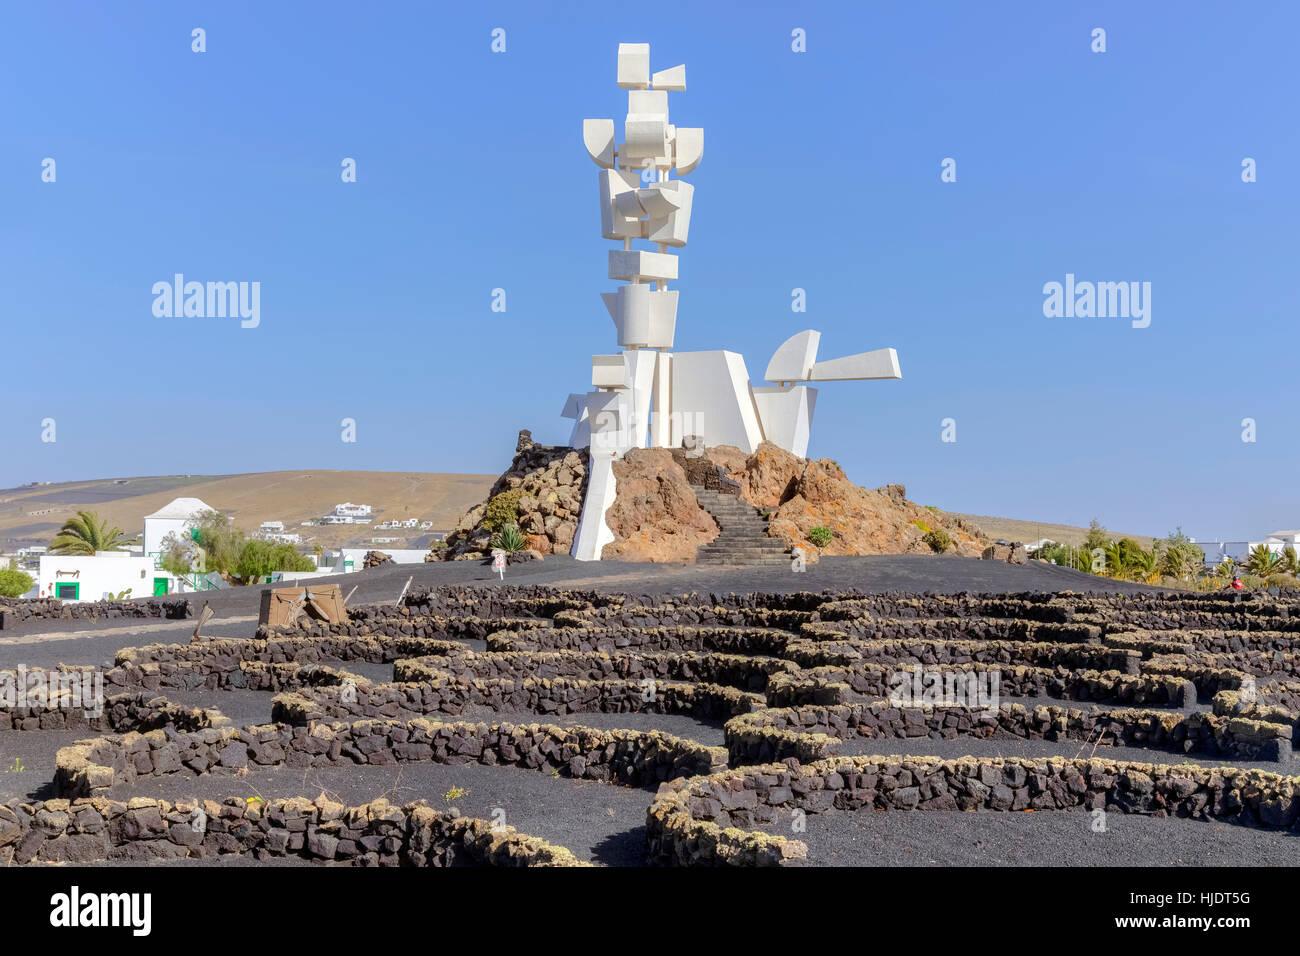 Monumento al Campesino, Tinajo, Lanzarote, Canary Islands, Spain - Stock Image